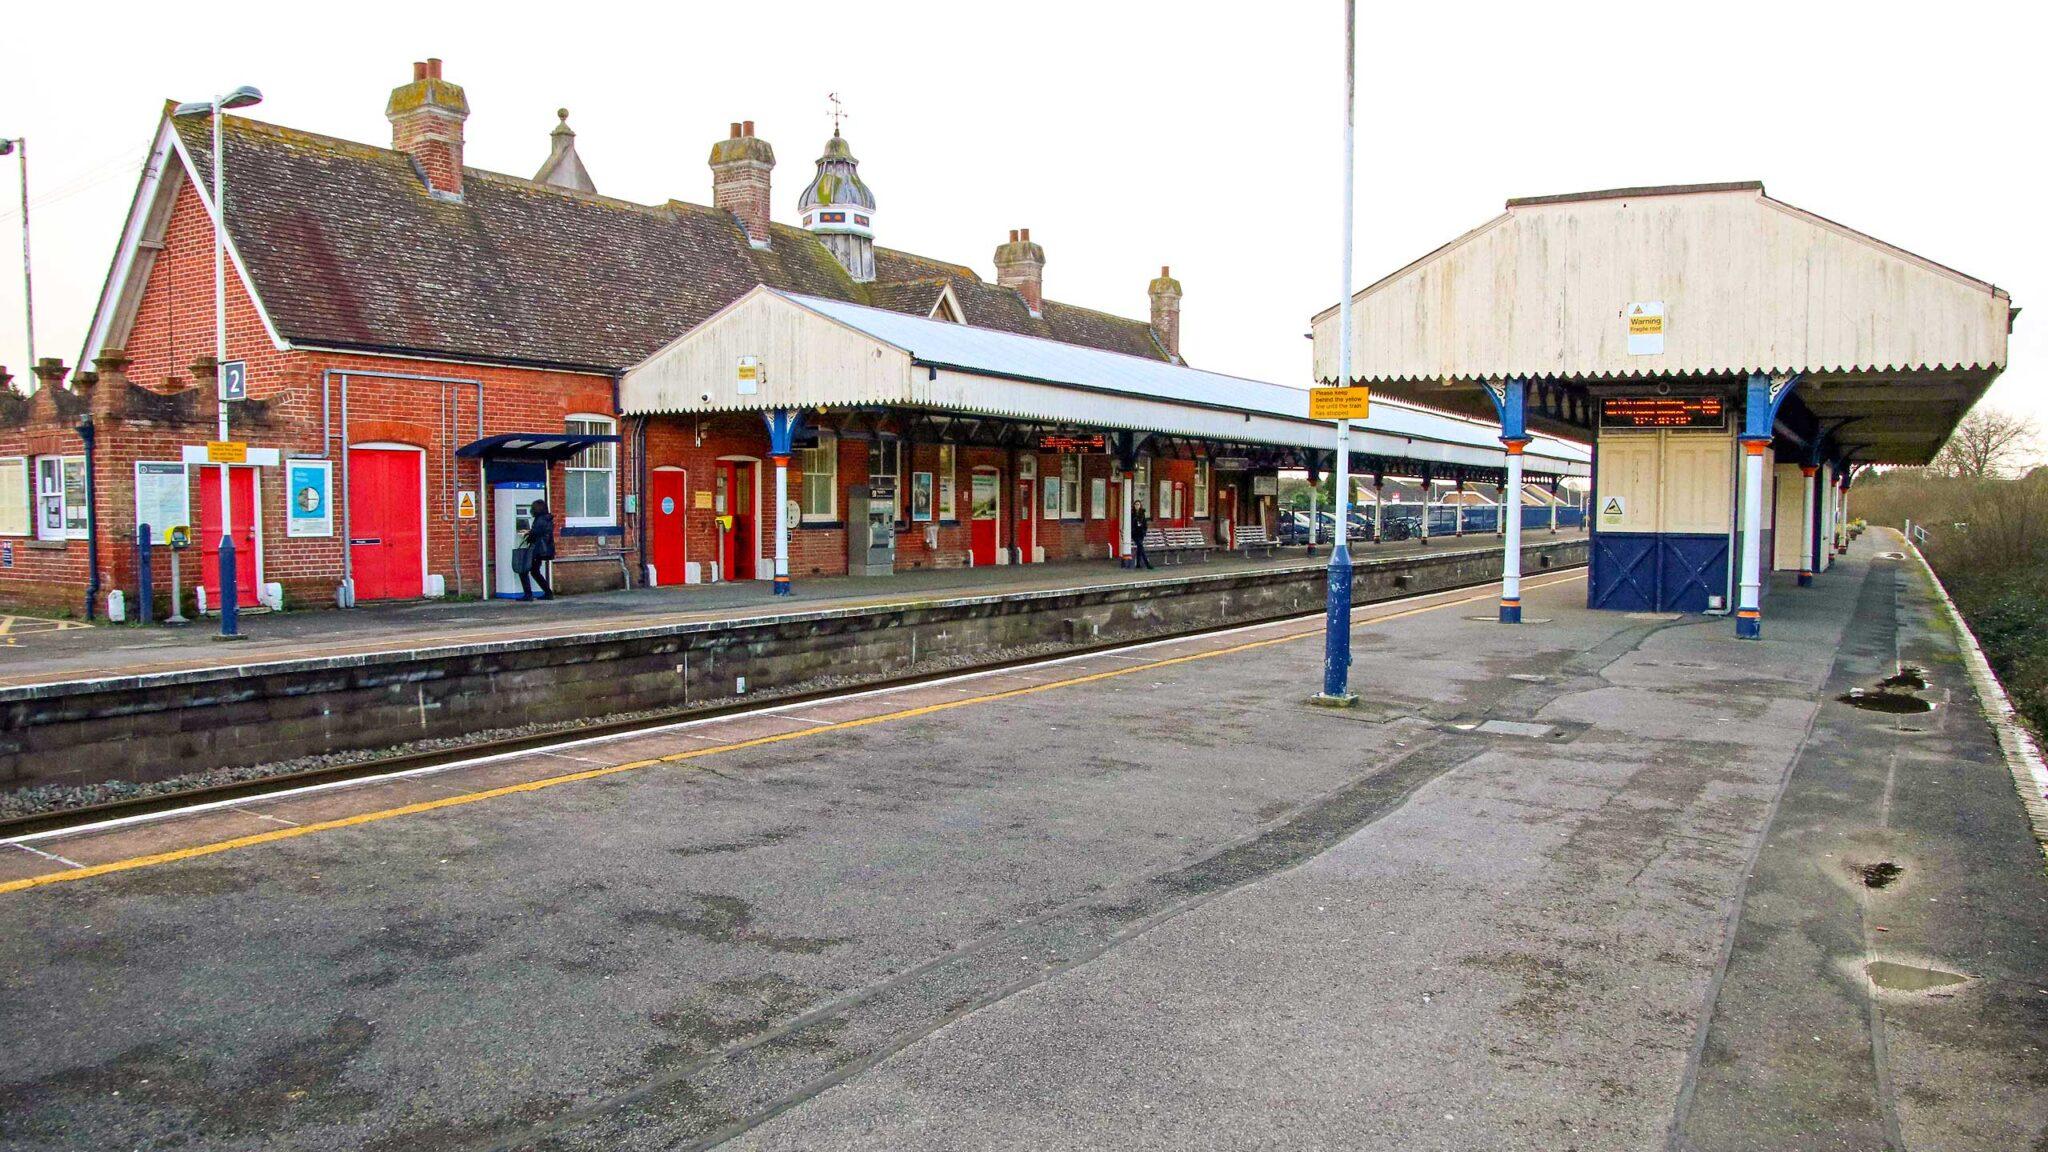 Purbeck Community Rail Partnership Wareham Train Station 007 2560x1440px